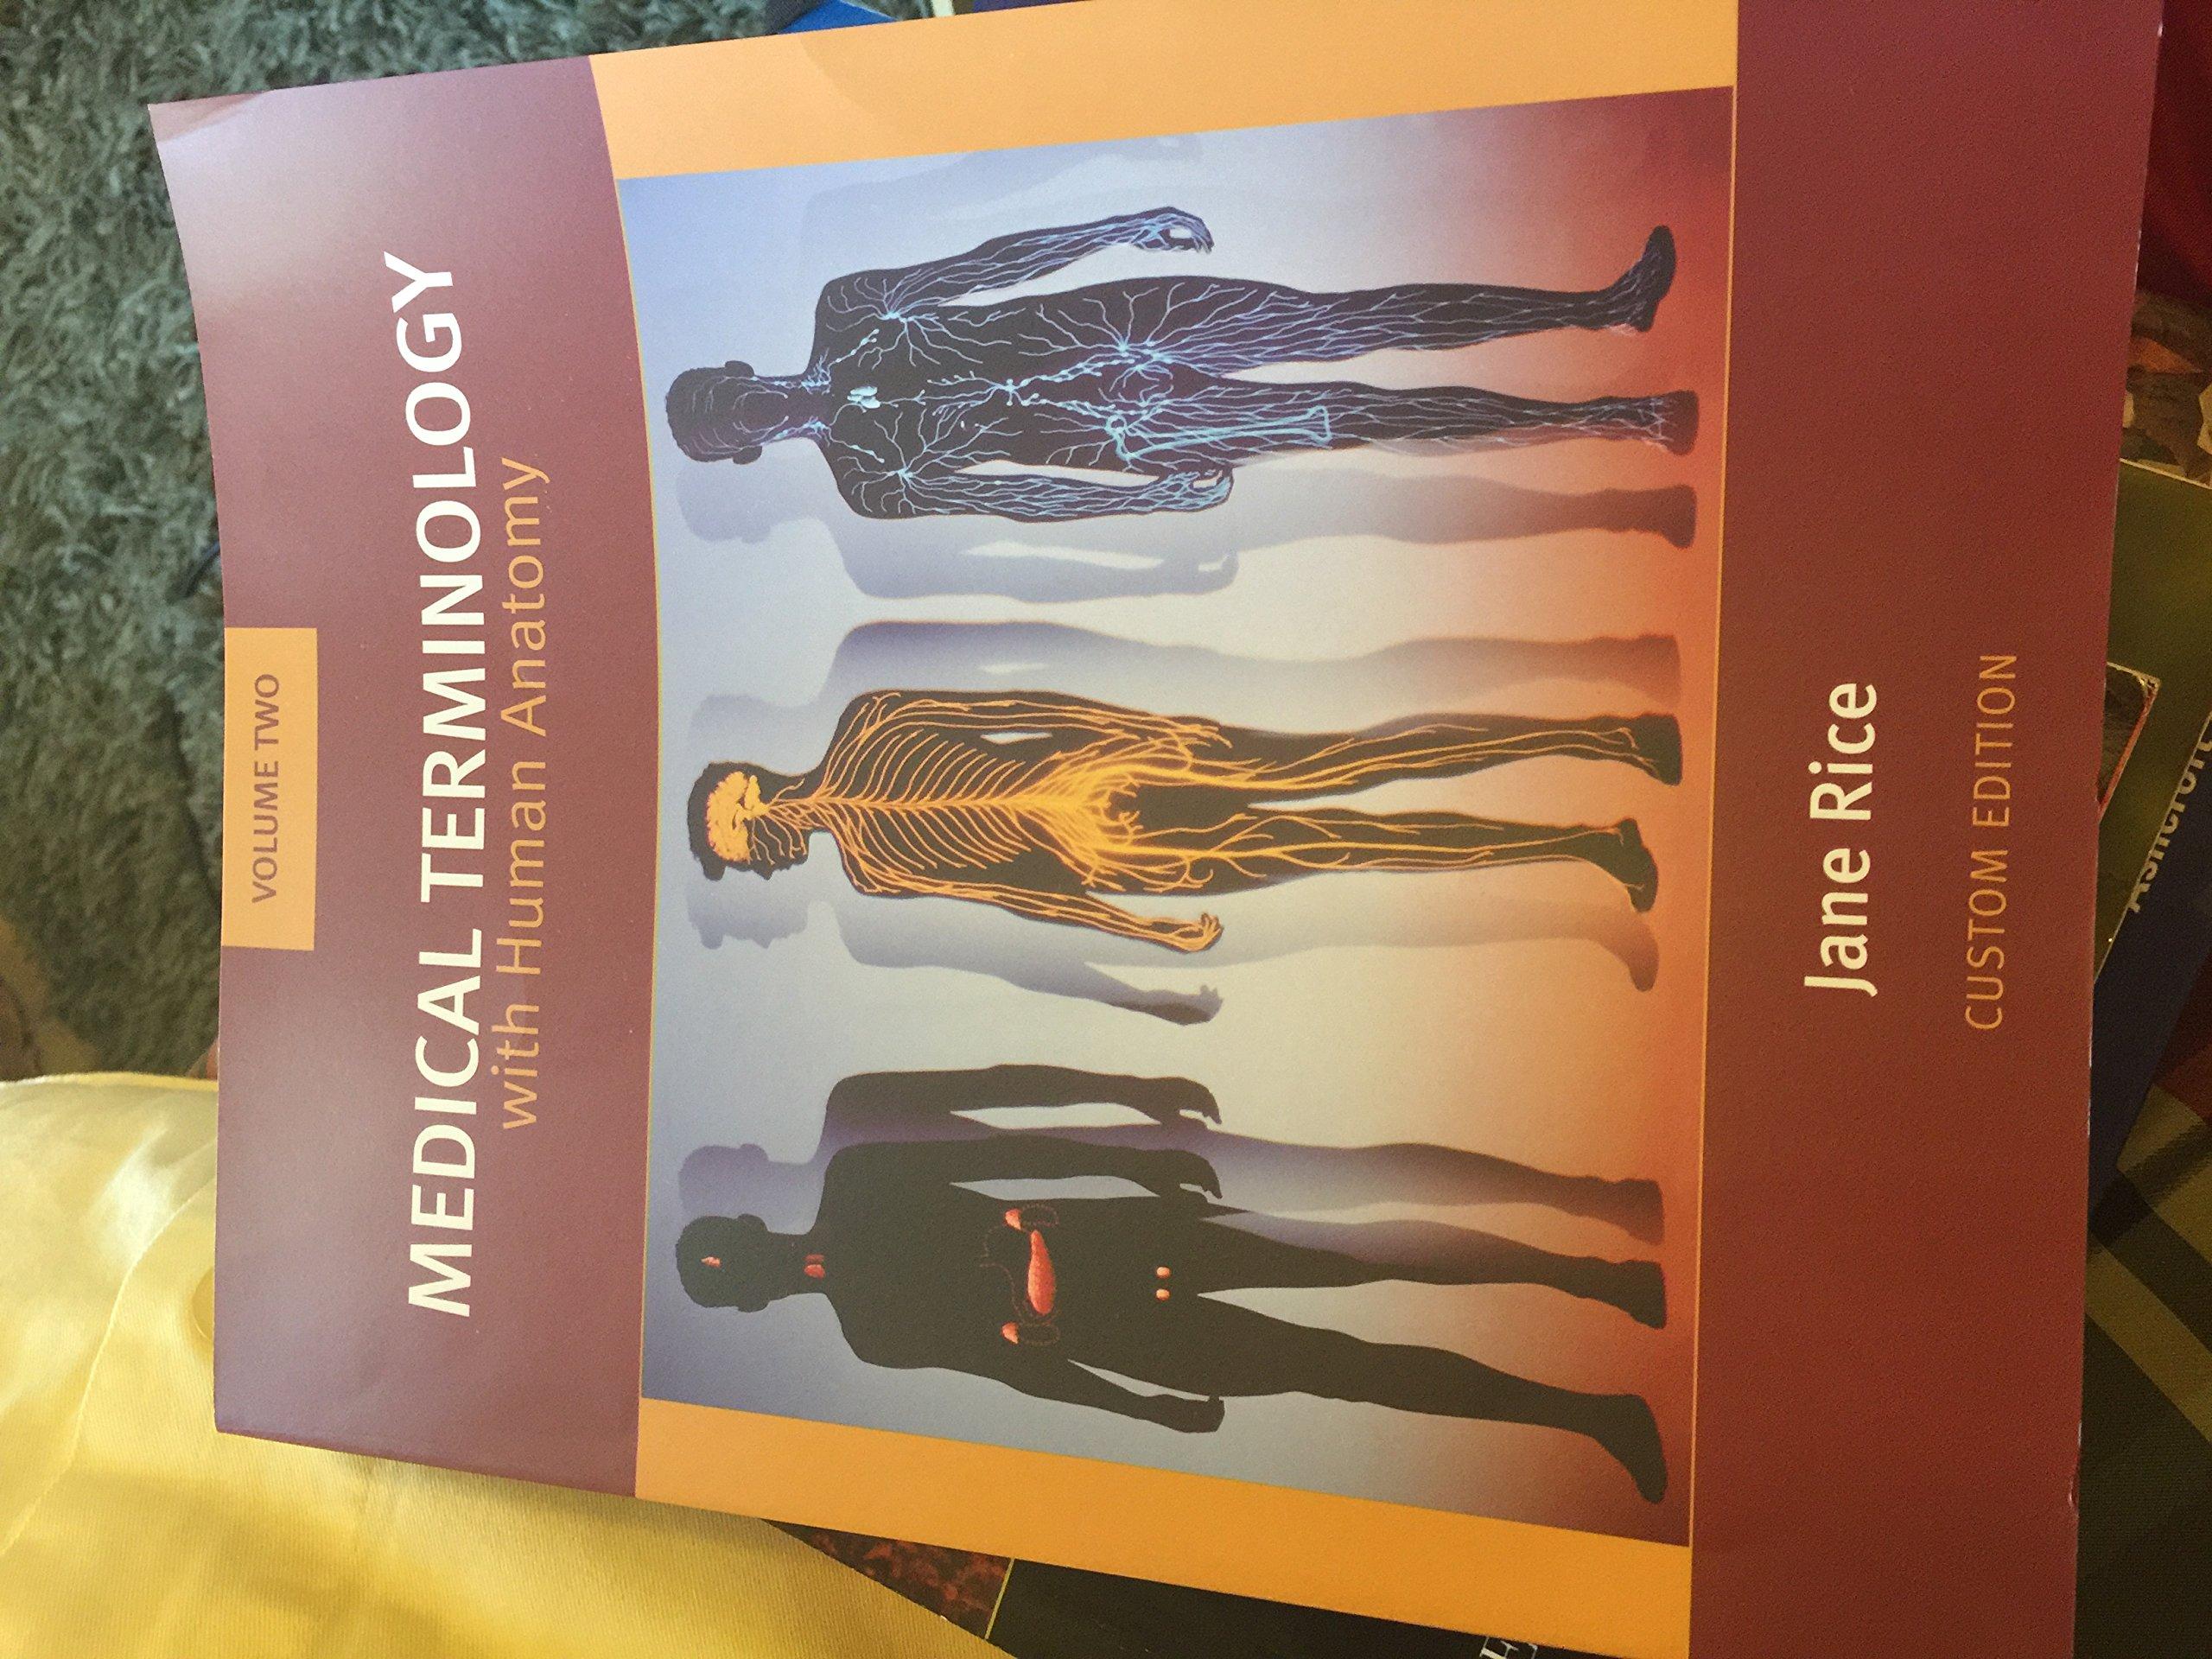 Medical Terminology With Human Anatomy Vol 2 Jane Rice